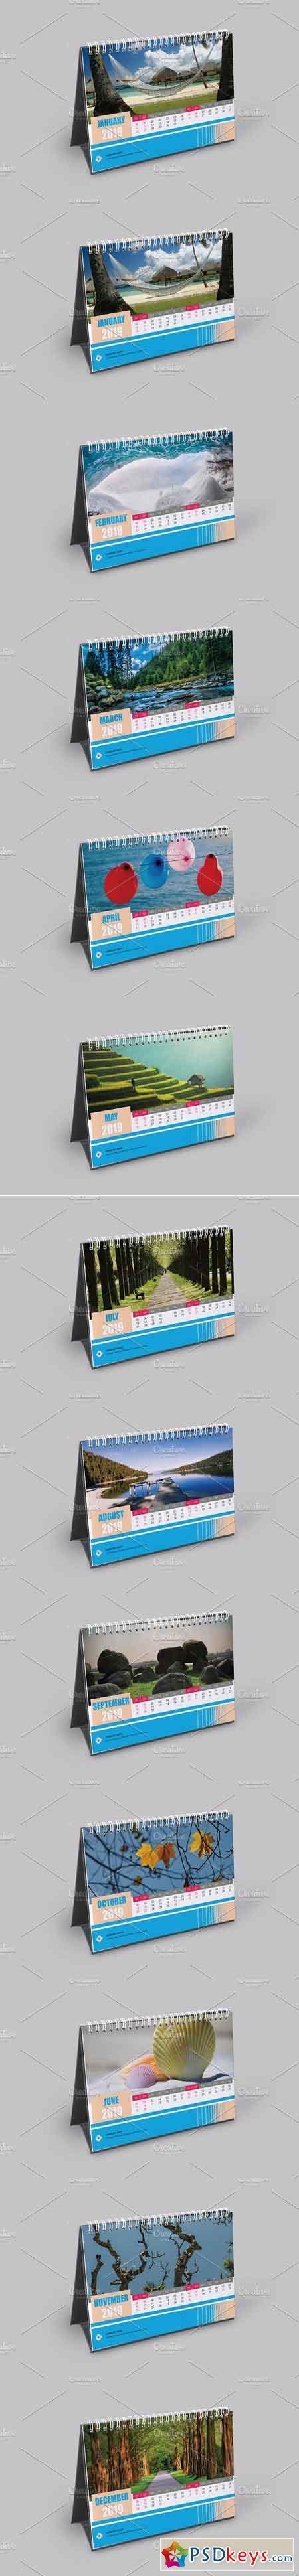 Desk Calendar 2019 V15 3051070